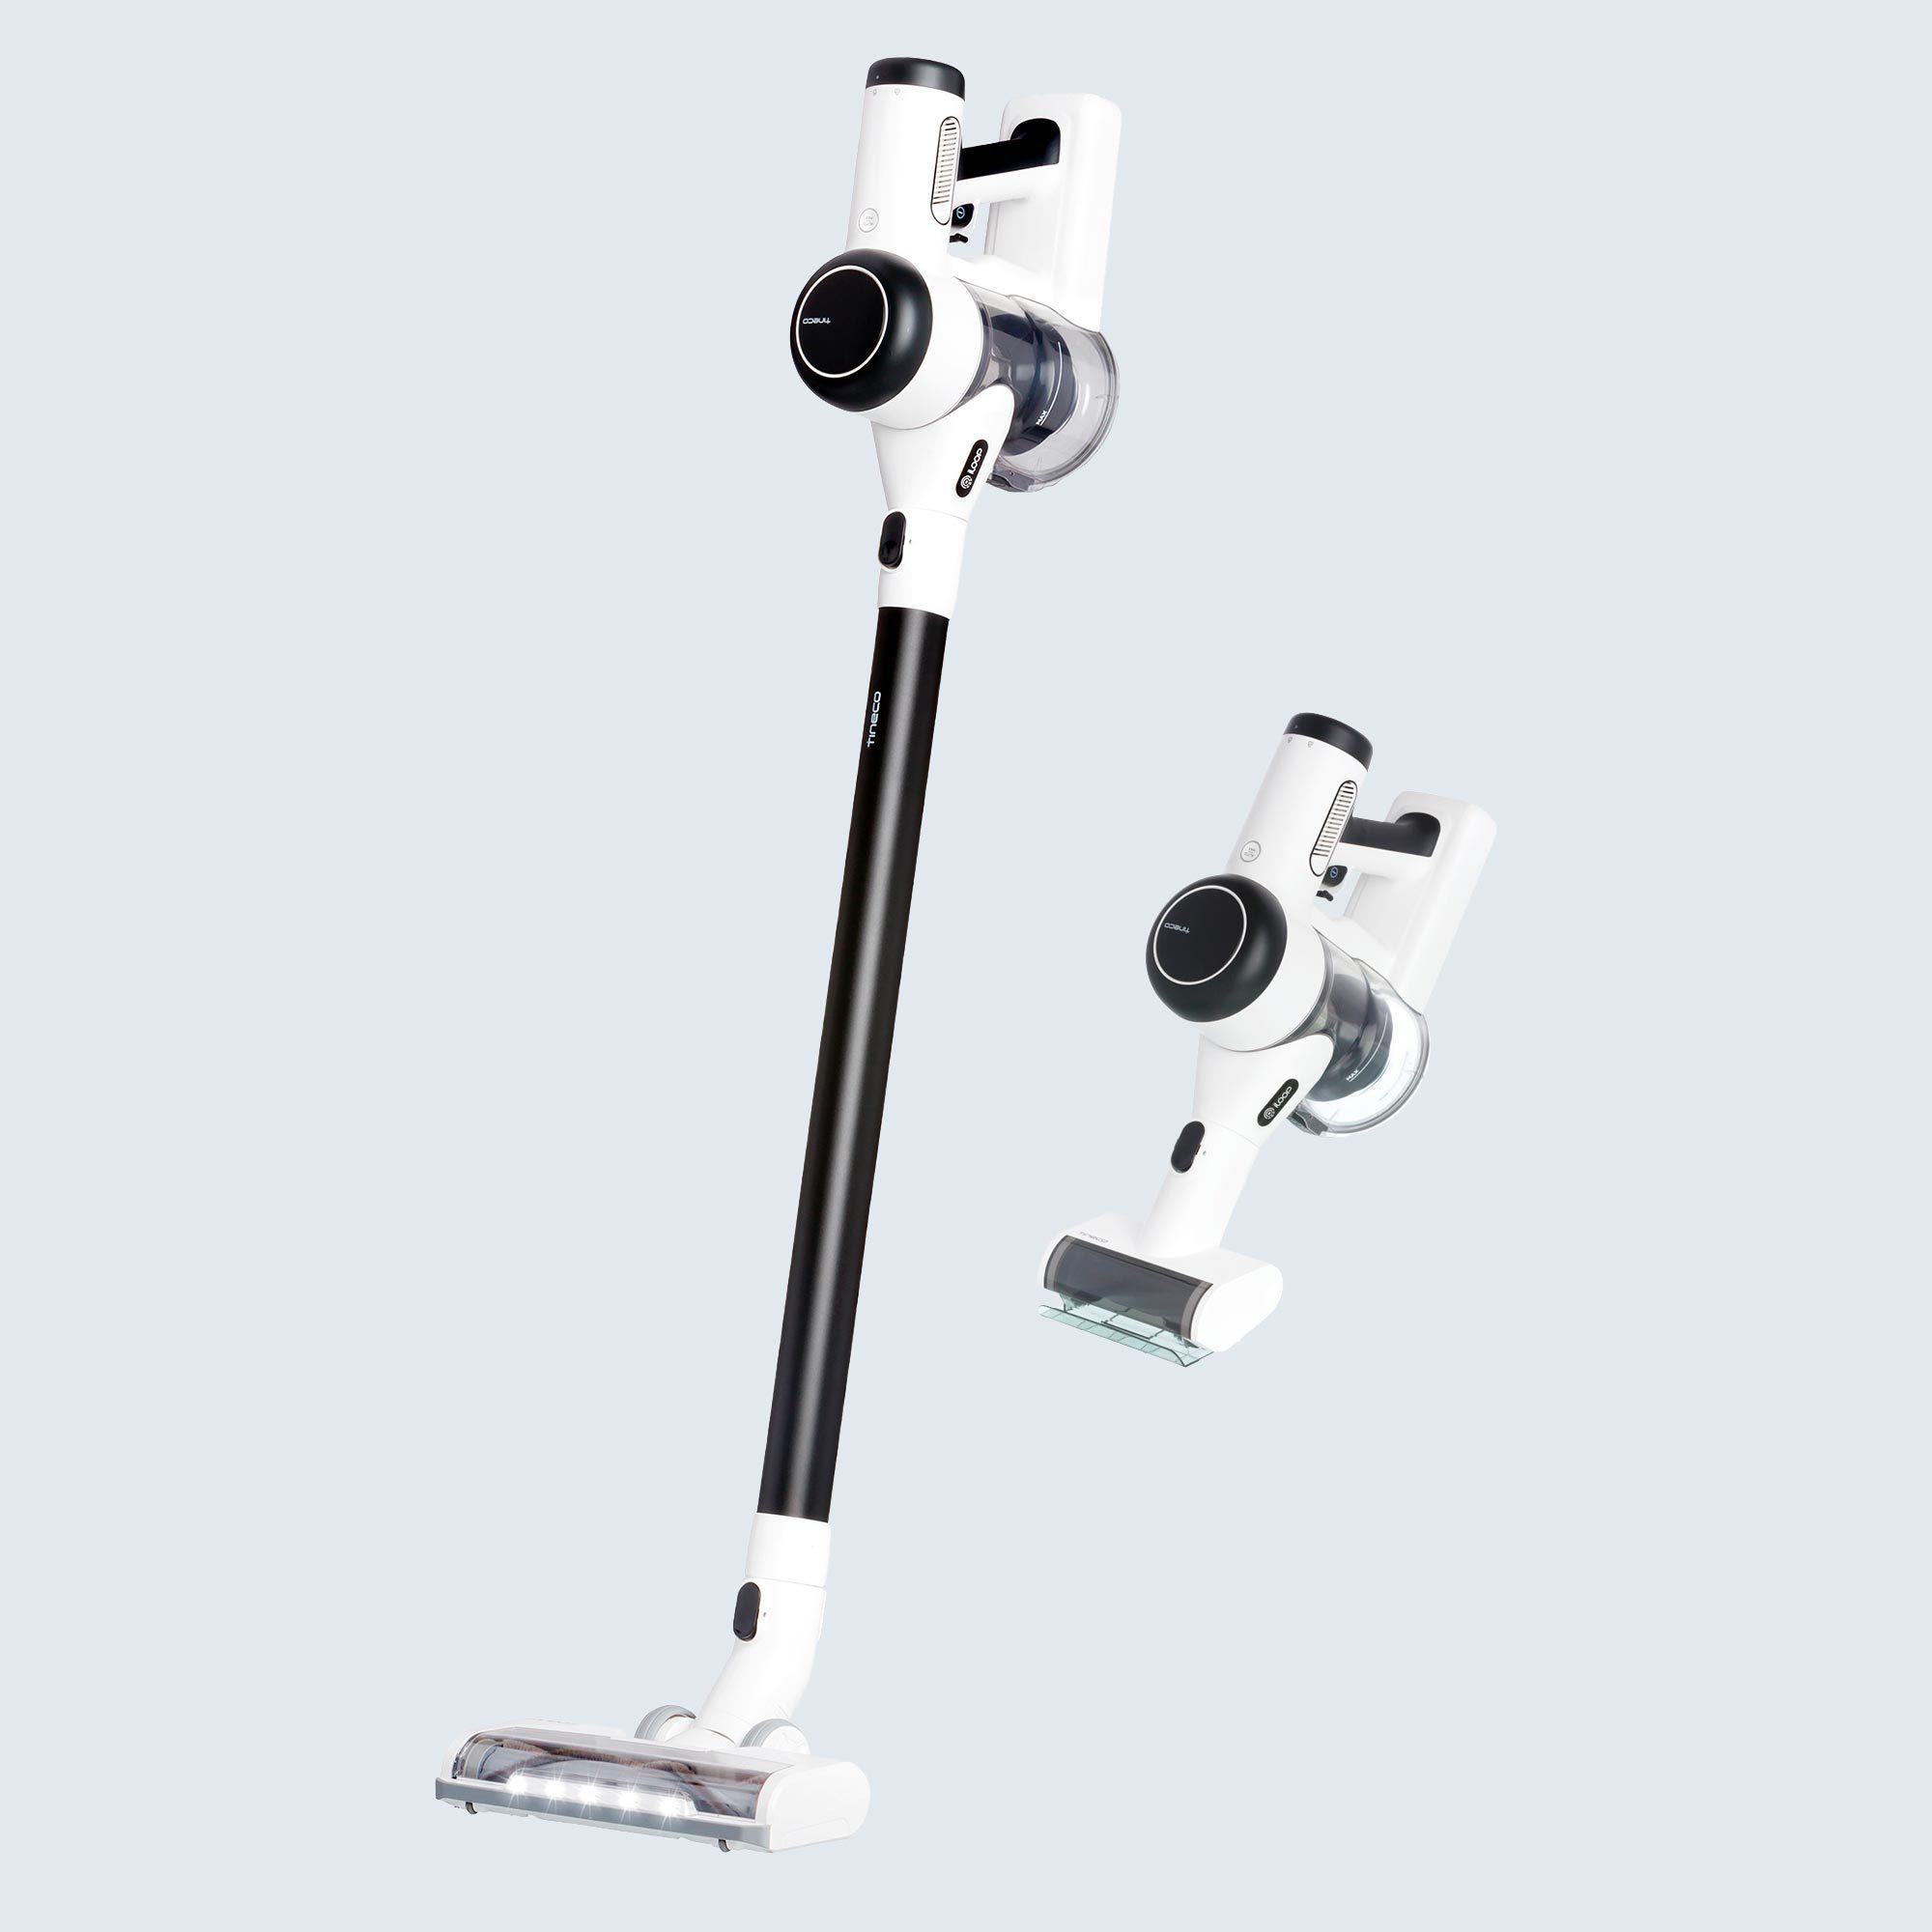 Tineco Pure One X Cordless Smart Vacuum